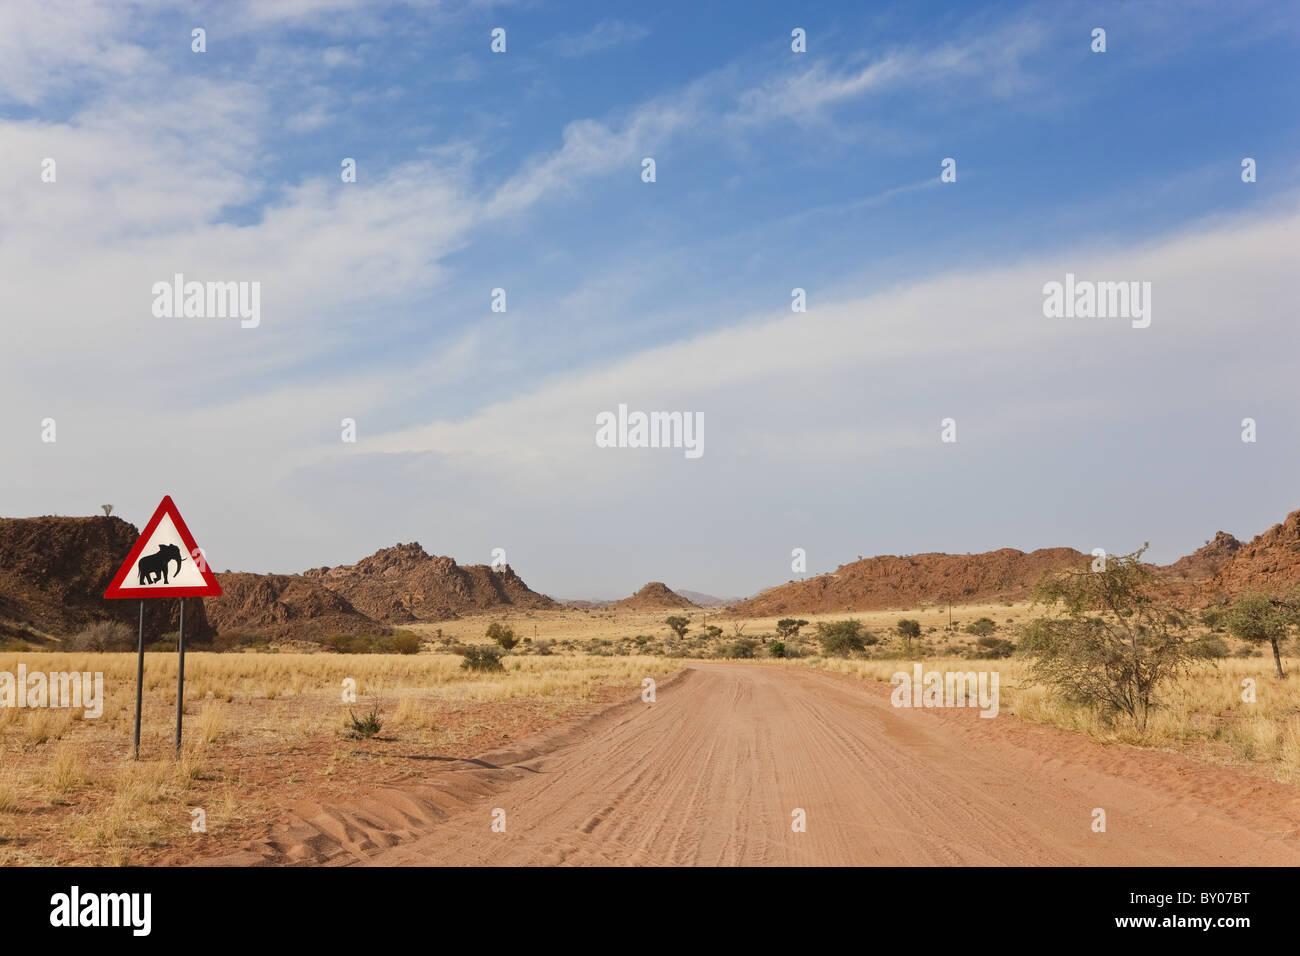 Elephant road sign & road, Damaraland, Namibie Banque D'Images